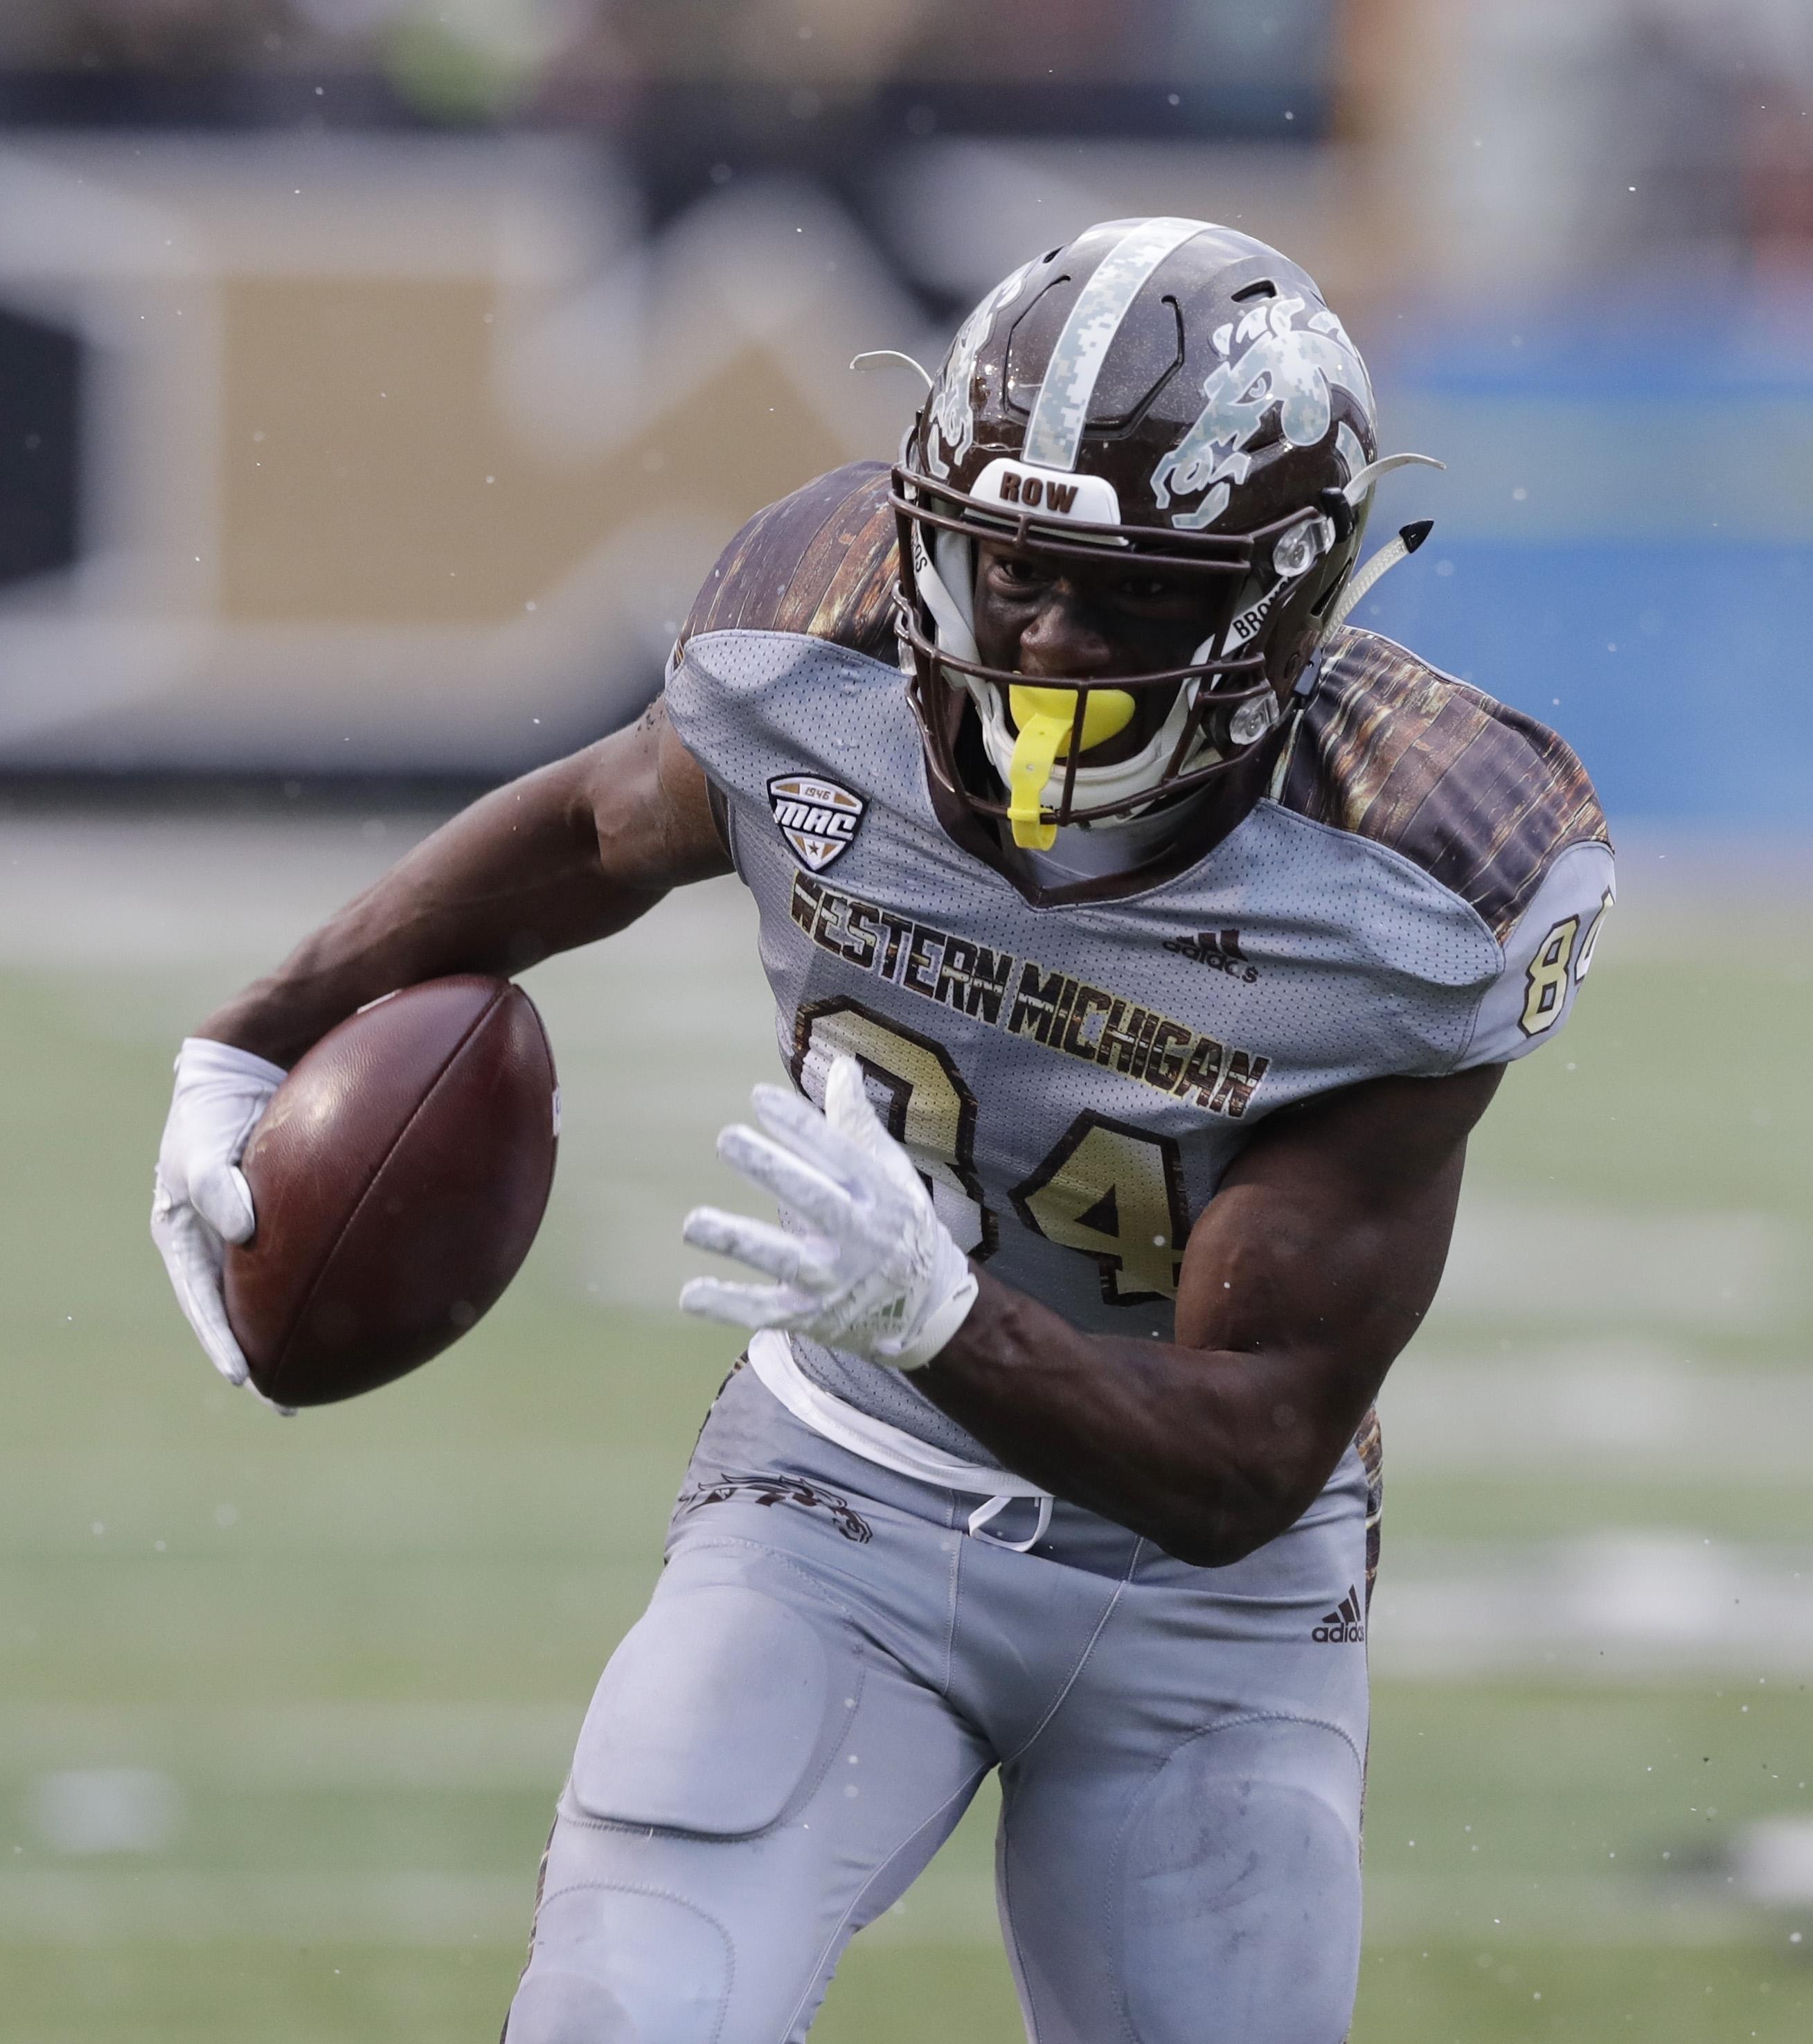 Western Michigan wide receiver Corey Davis (84) runs for a touchdown during the first half of an NCAA college football game against Buffalo, Saturday, Nov. 19, 2016, in Kalamazoo, Mich. (AP Photo/Carlos Osorio)